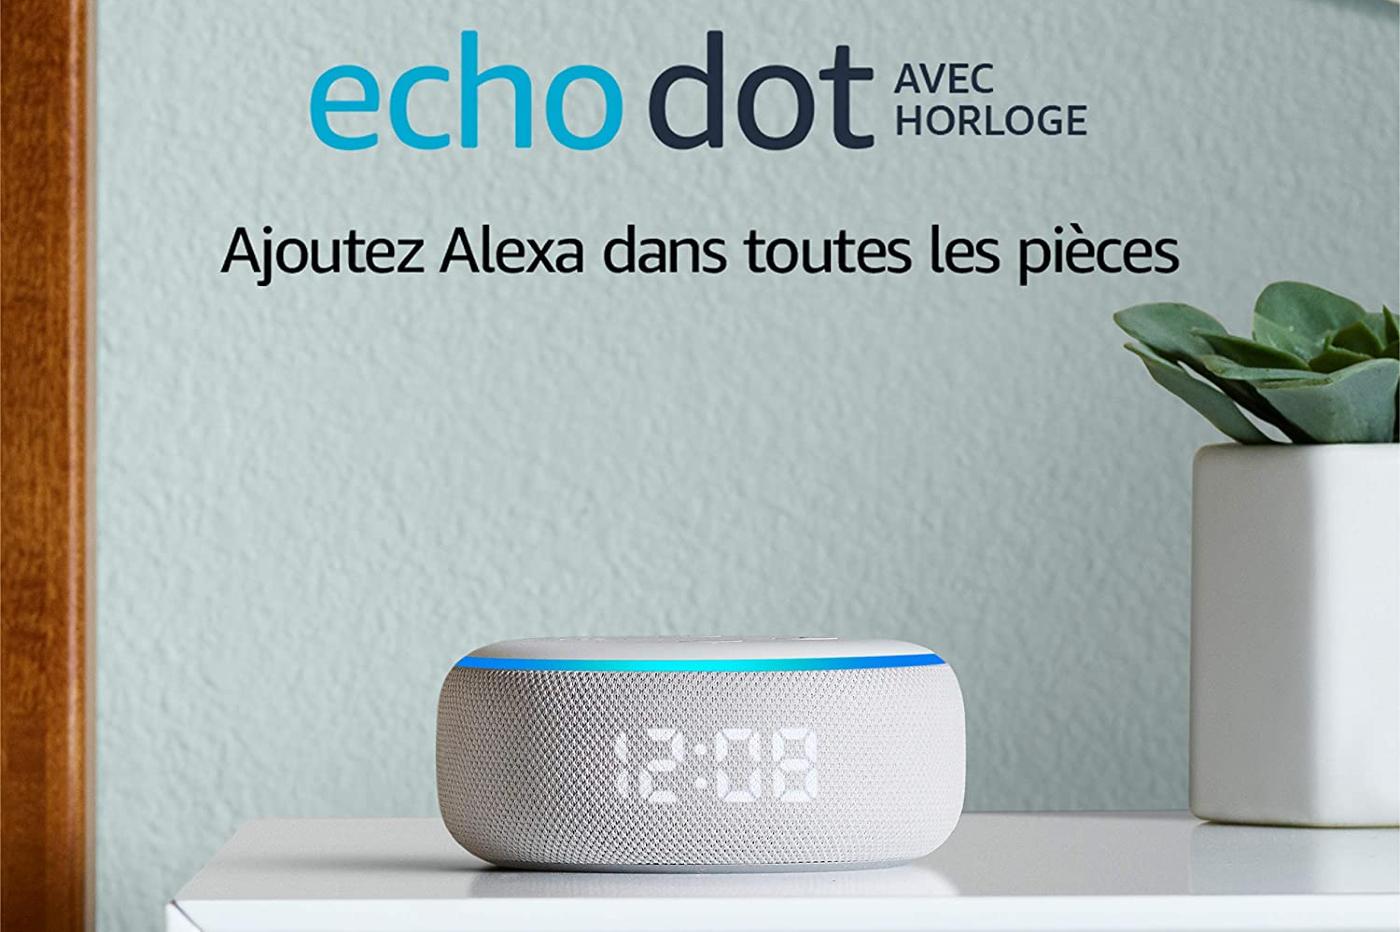 EchoDot Horloge